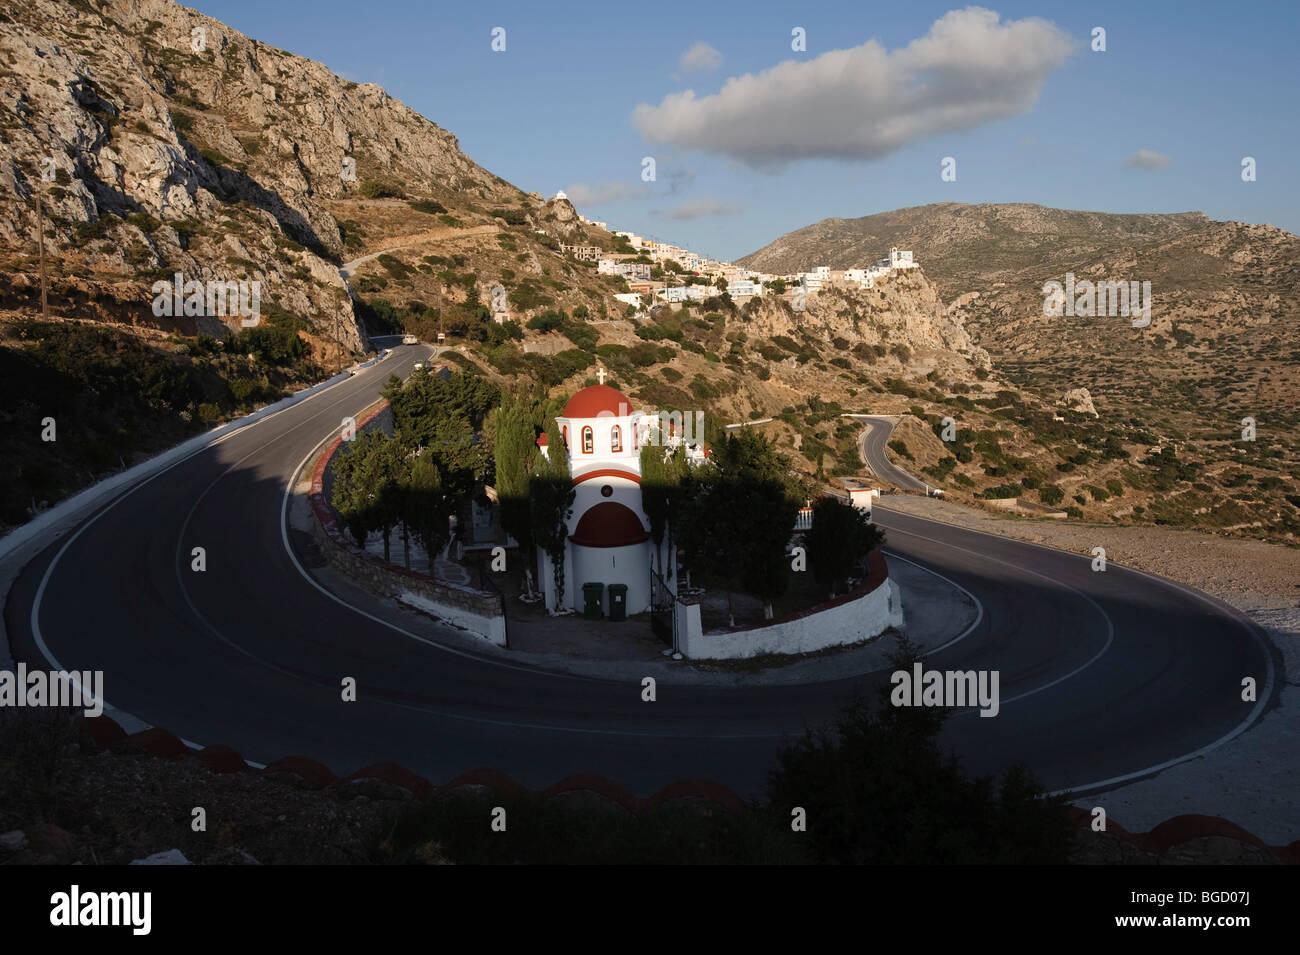 Cemetery of Menetes, Karpathos, Aegean Islands, Aegean Sea, Greece, Europe Stock Photo